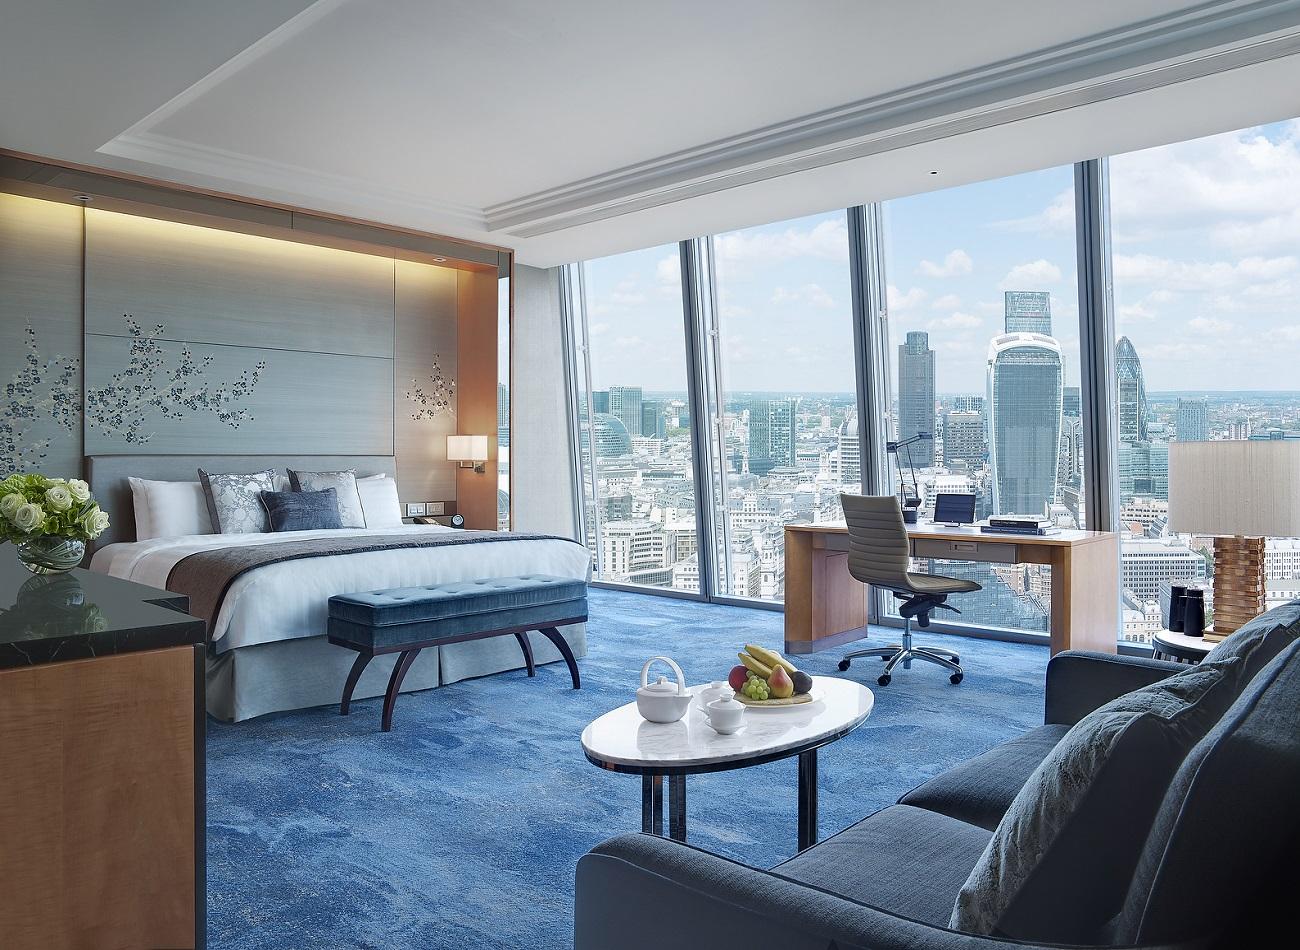 Shangri-La at the Shard London: 3rd Night Free + Luxury Circle Benefits